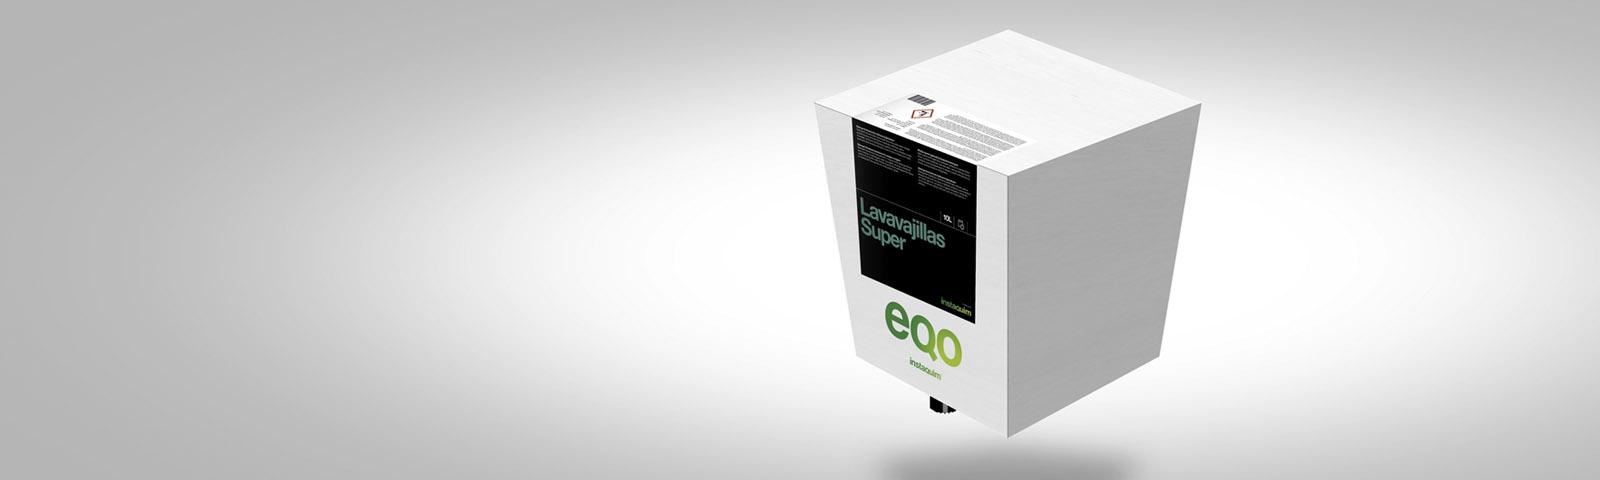 Eqo Bag in box